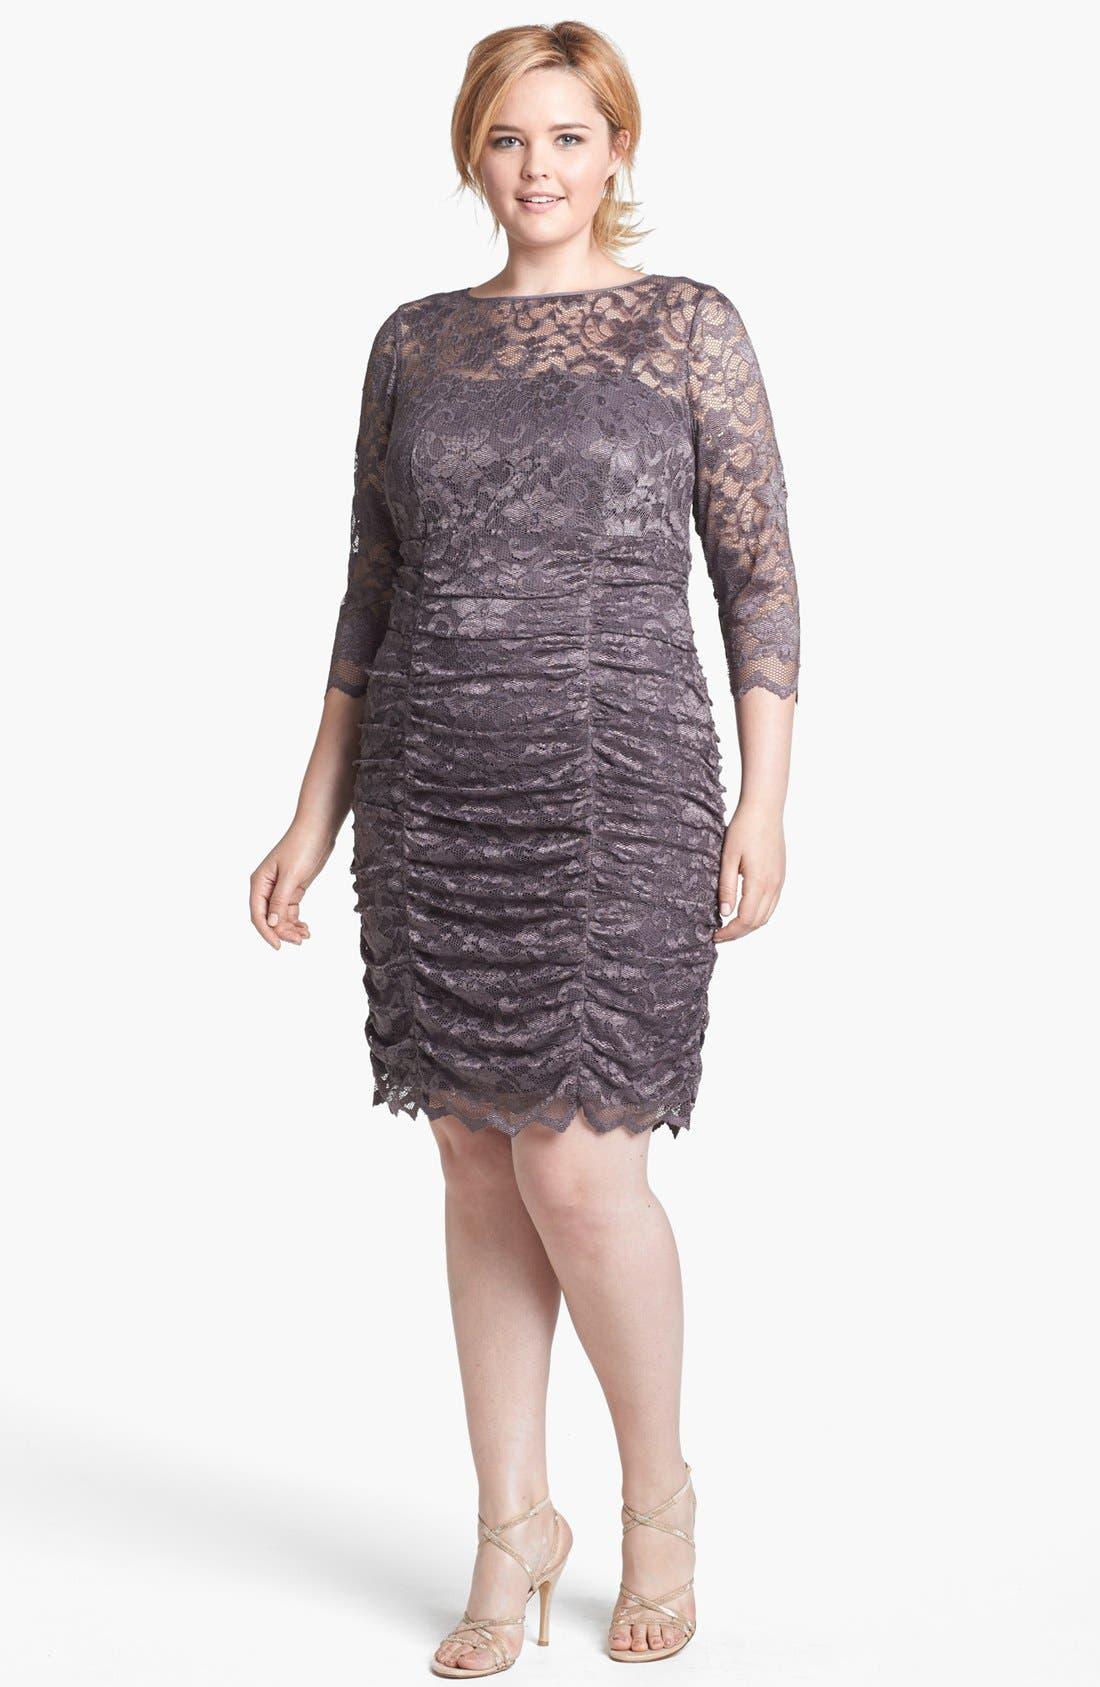 Alternate Image 1 Selected - Eliza J Ruched Lace Dress (Plus Size)